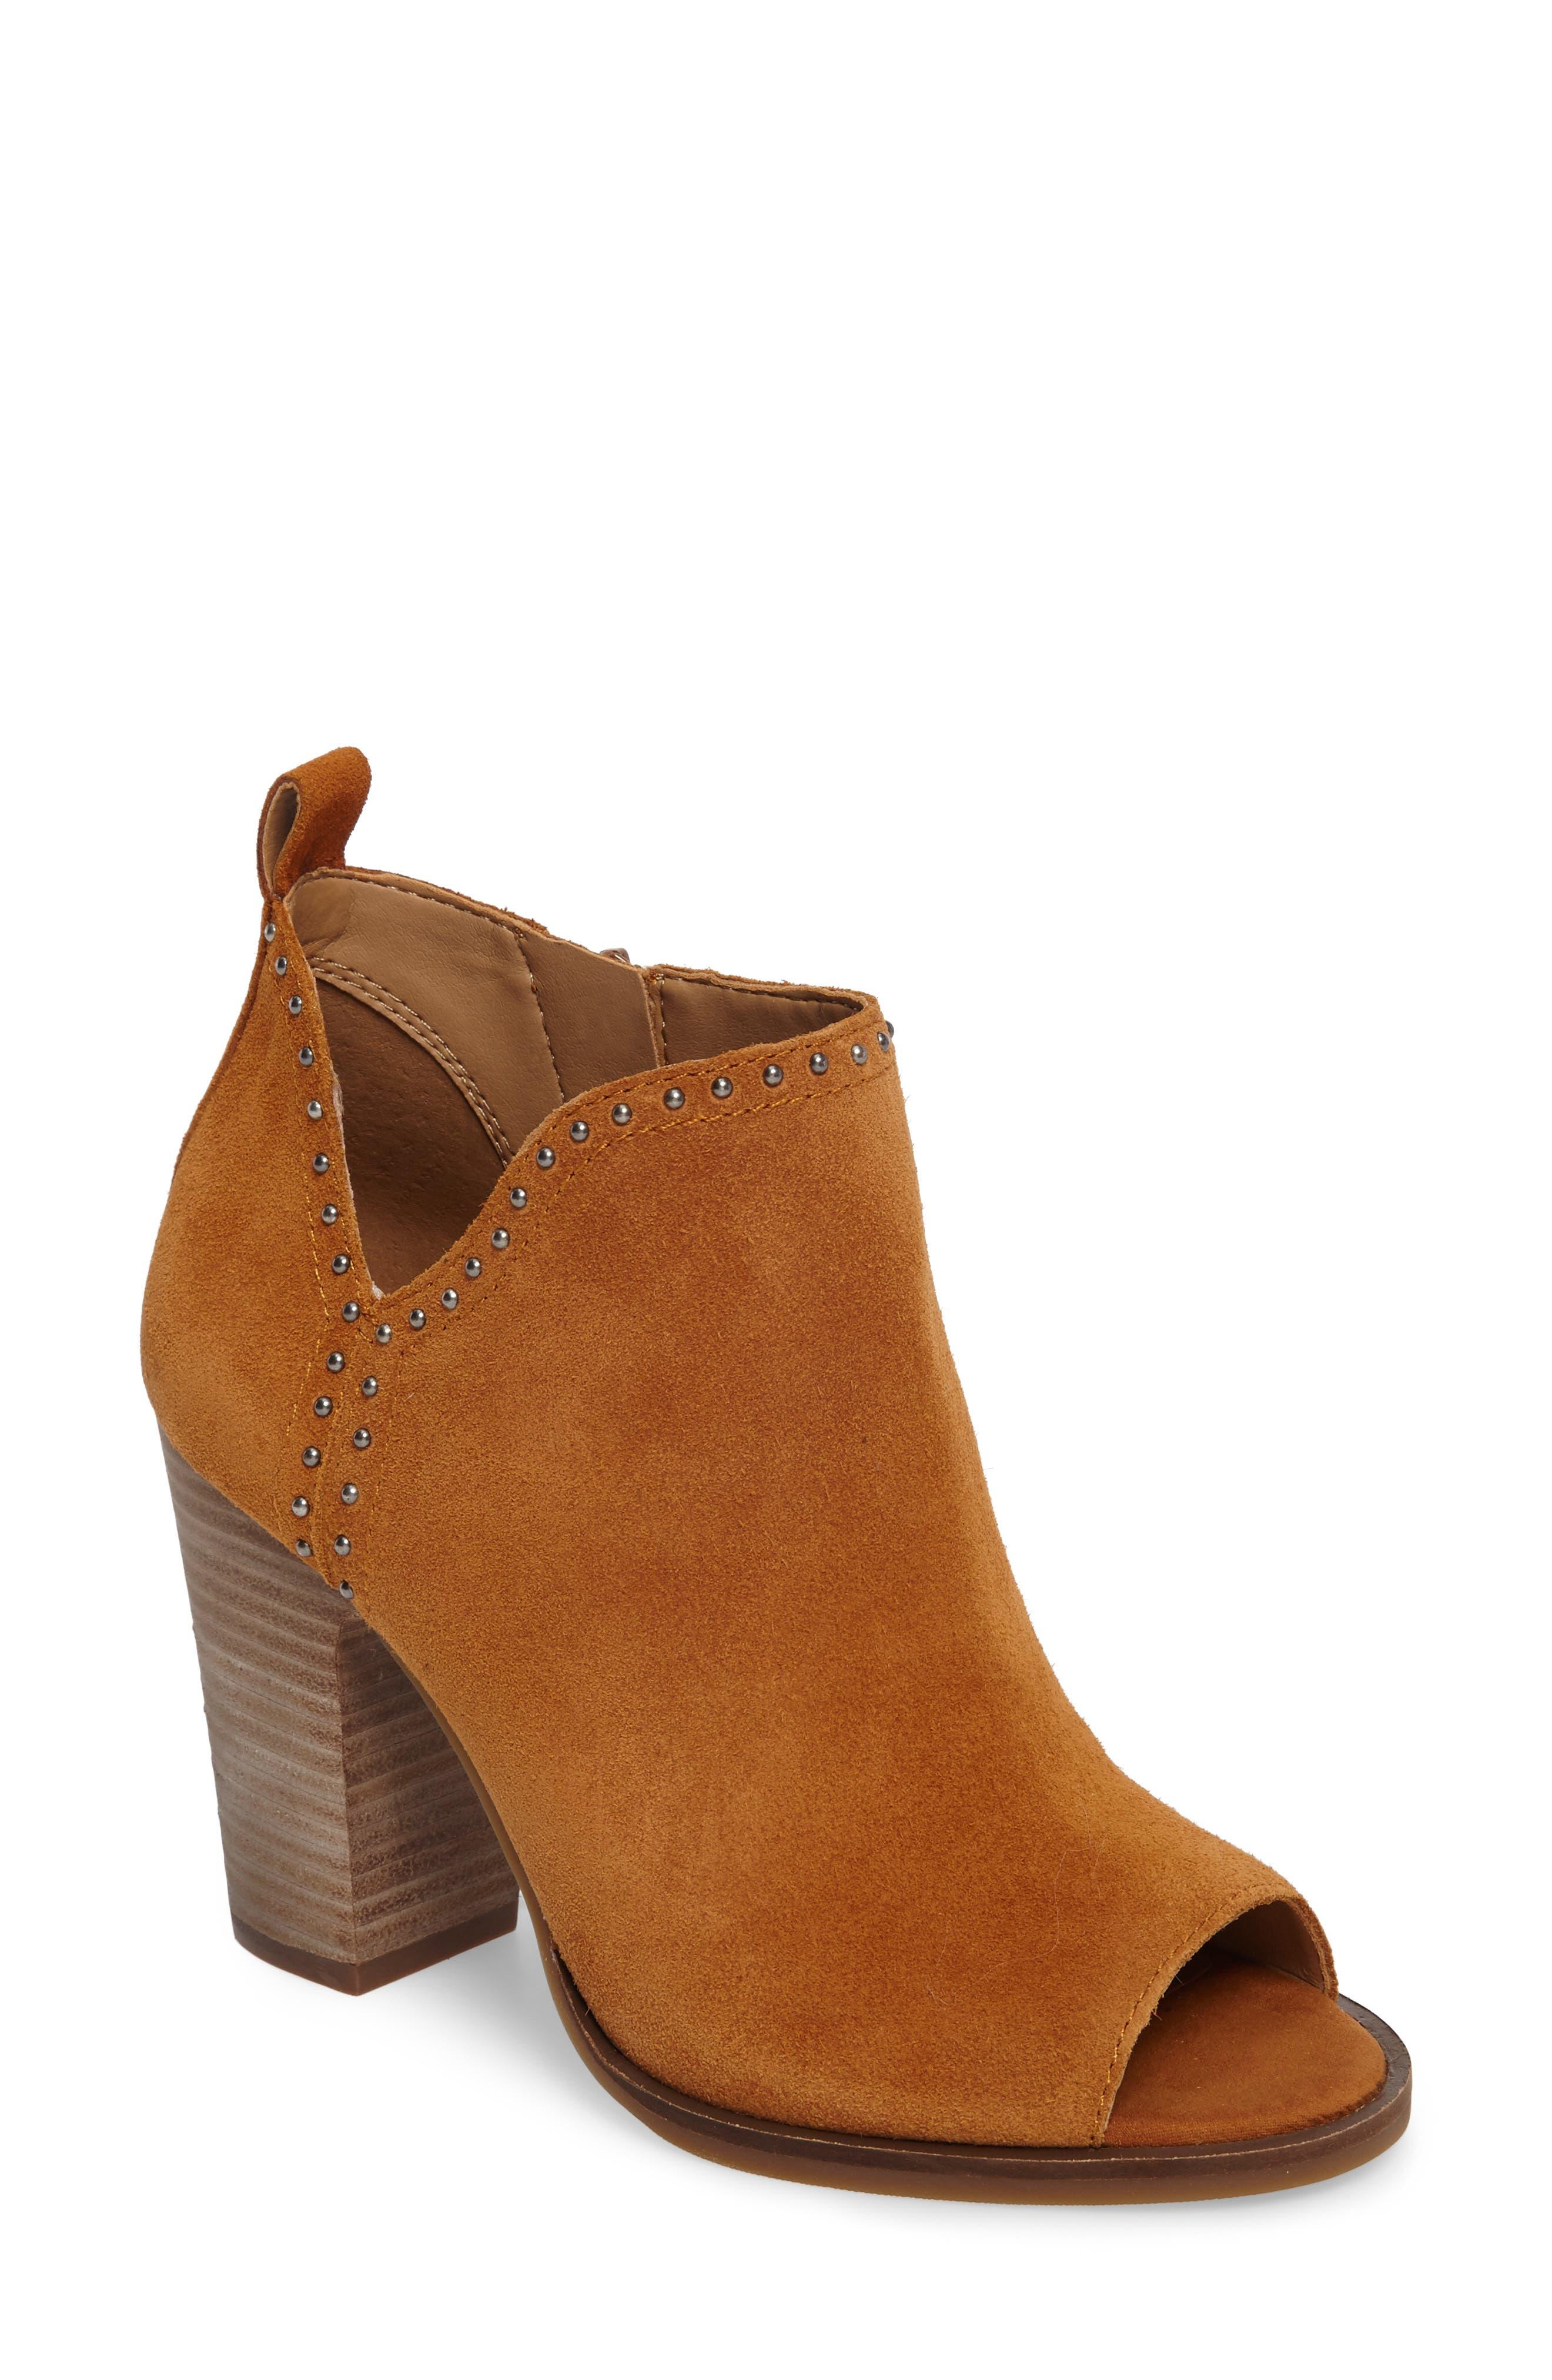 Main Image - Lucky Brand Lotisha Studded Open Toe Bootie (Women)